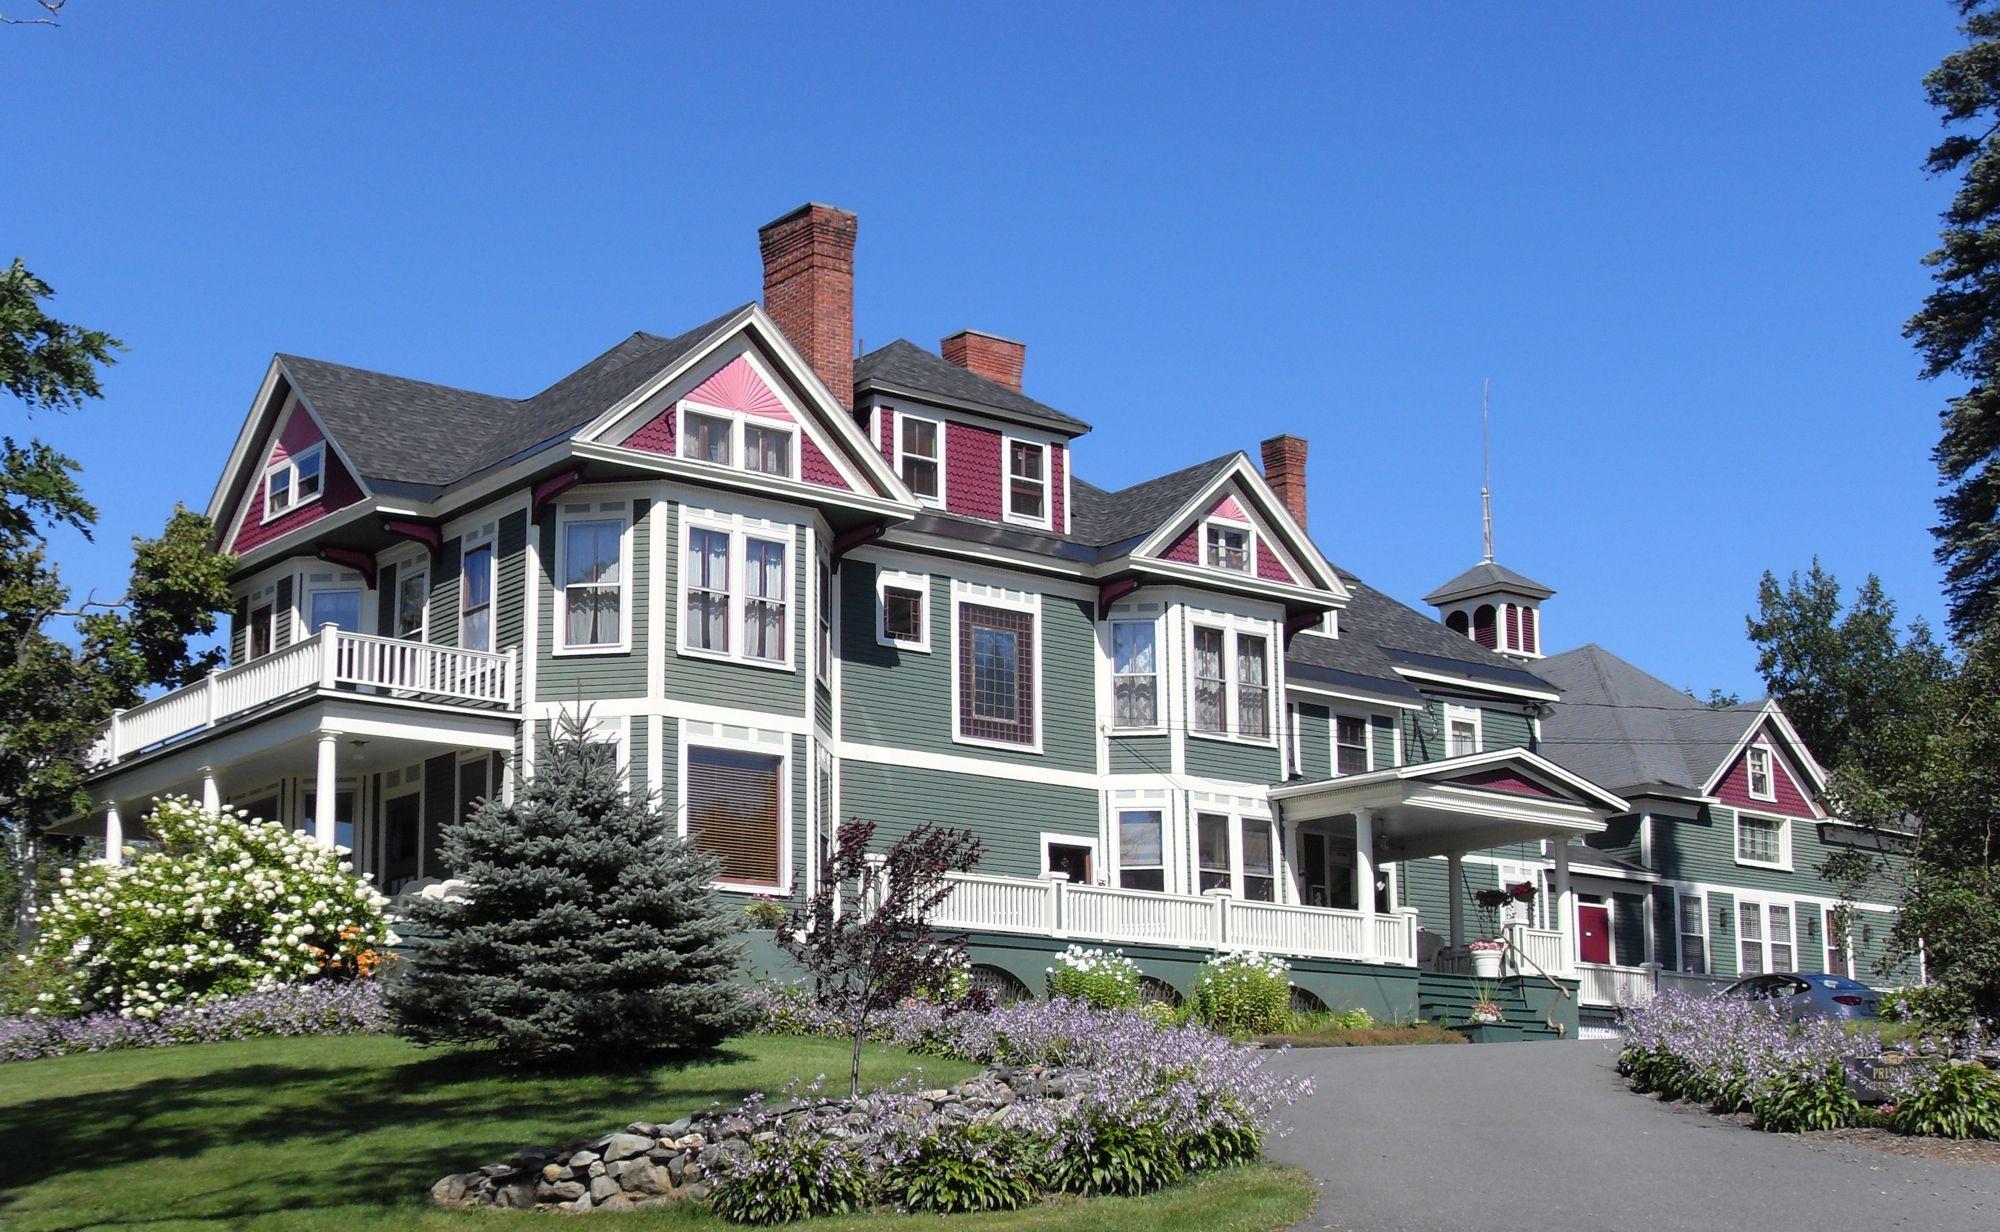 Greenville Inn at Moosehead Lake Bed and breakfast, Inn